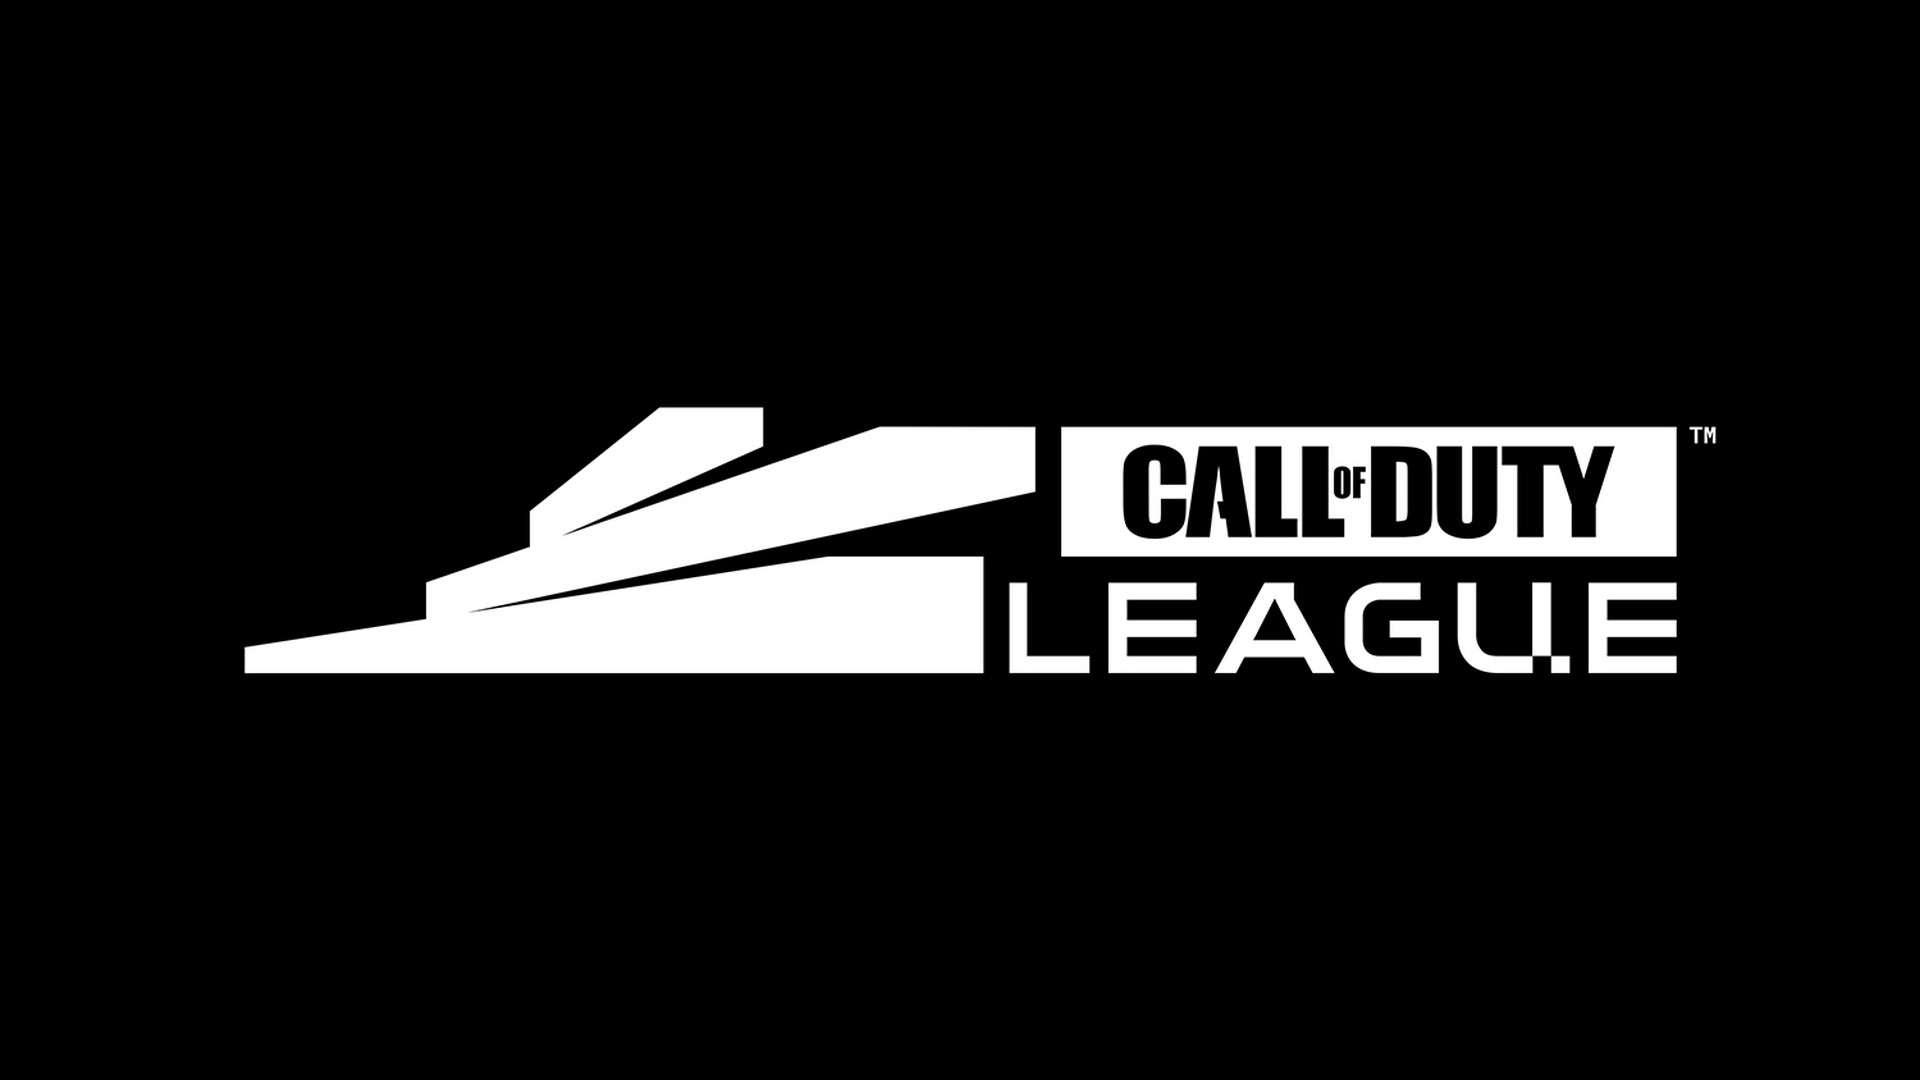 Call of Duty League Inaugural Season Launches January 24, 2020